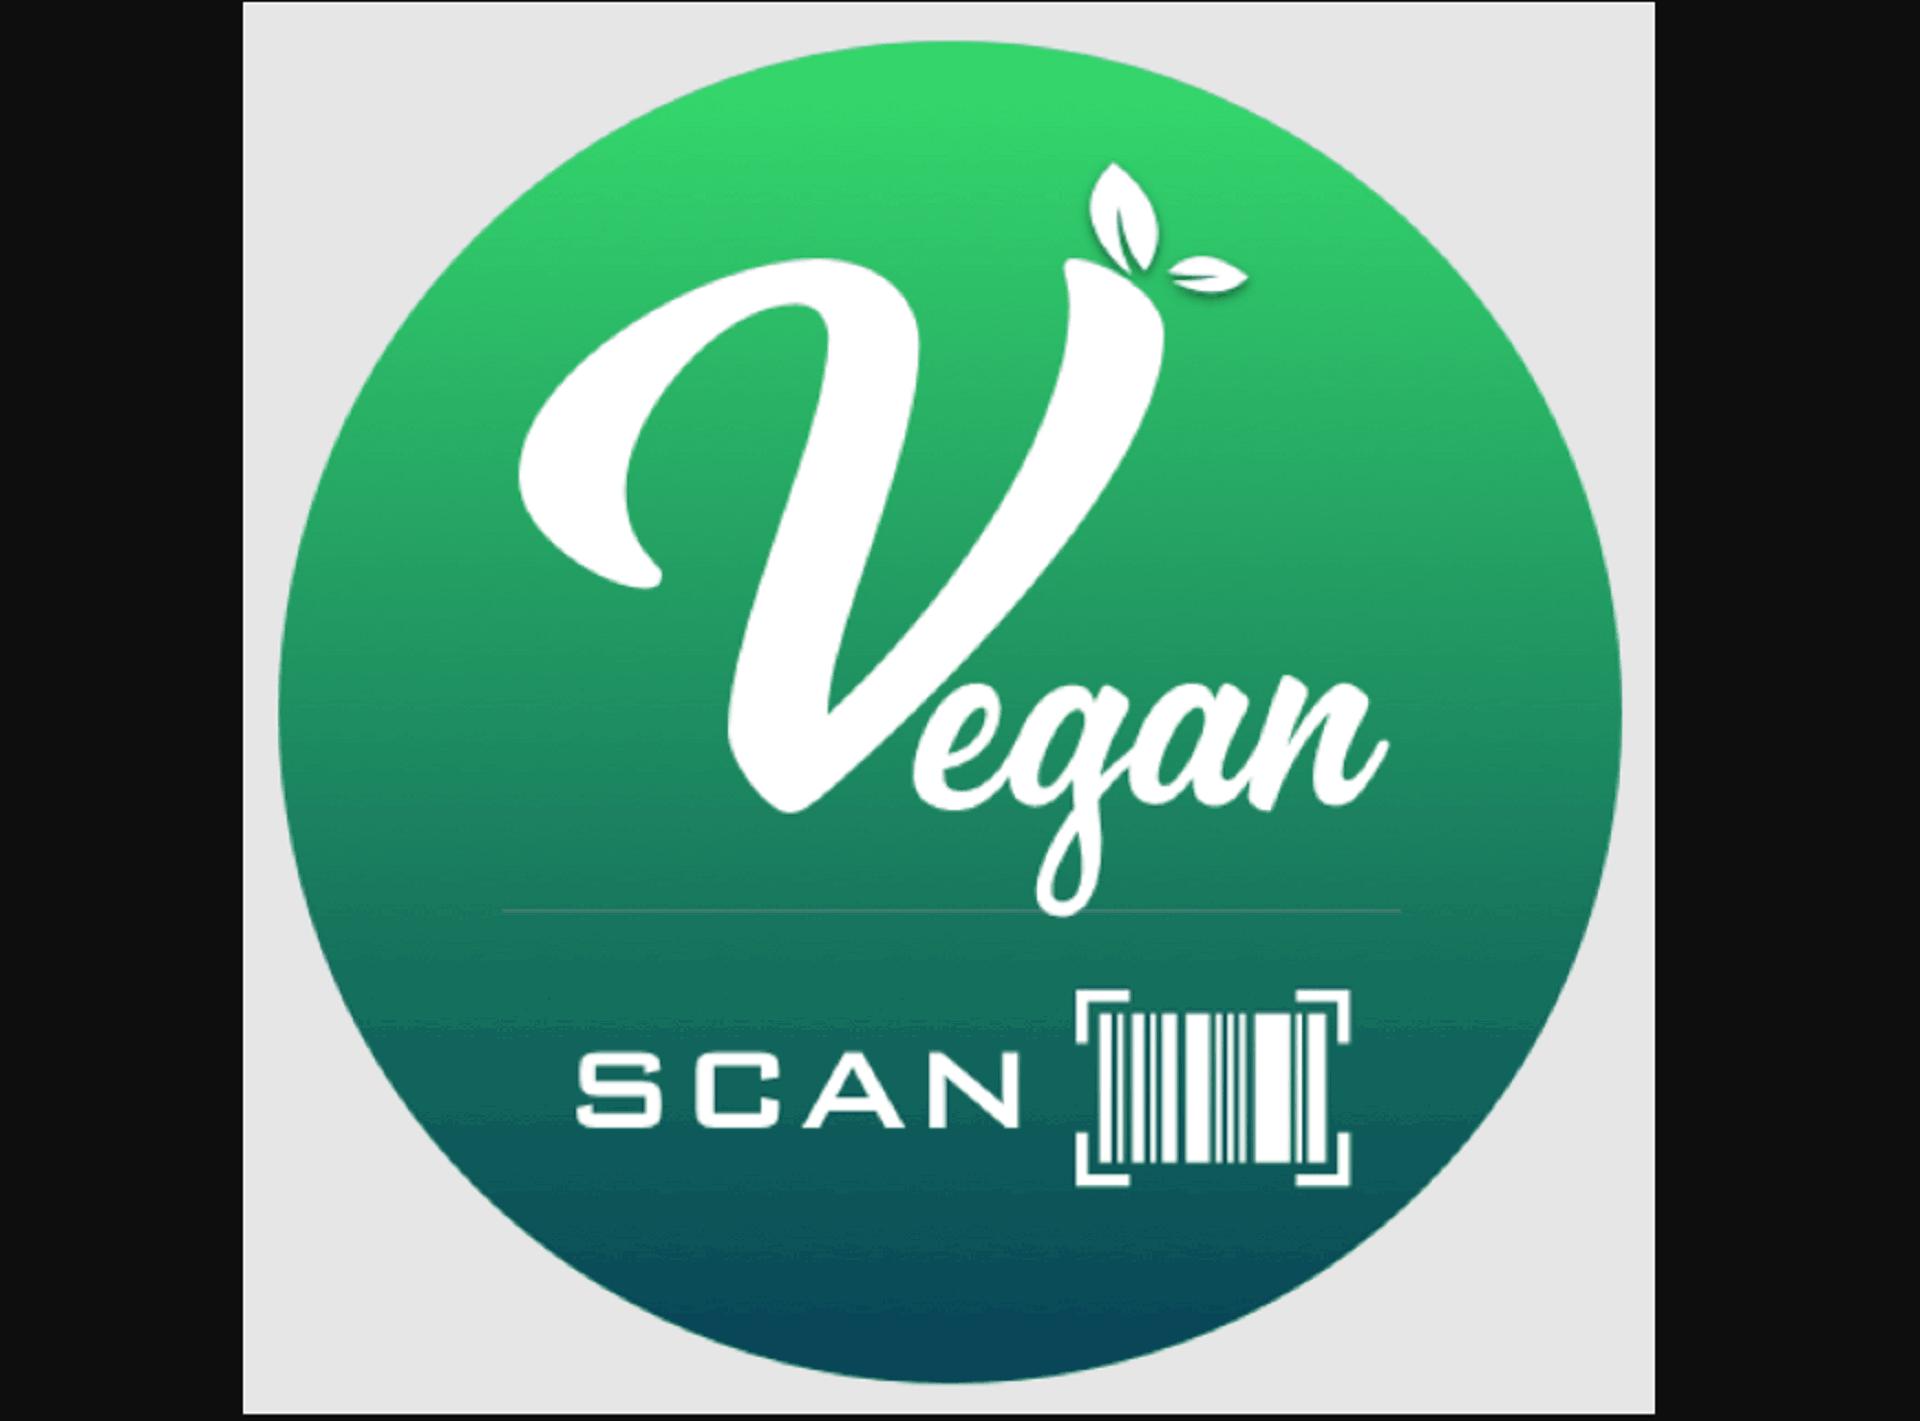 scan vegan